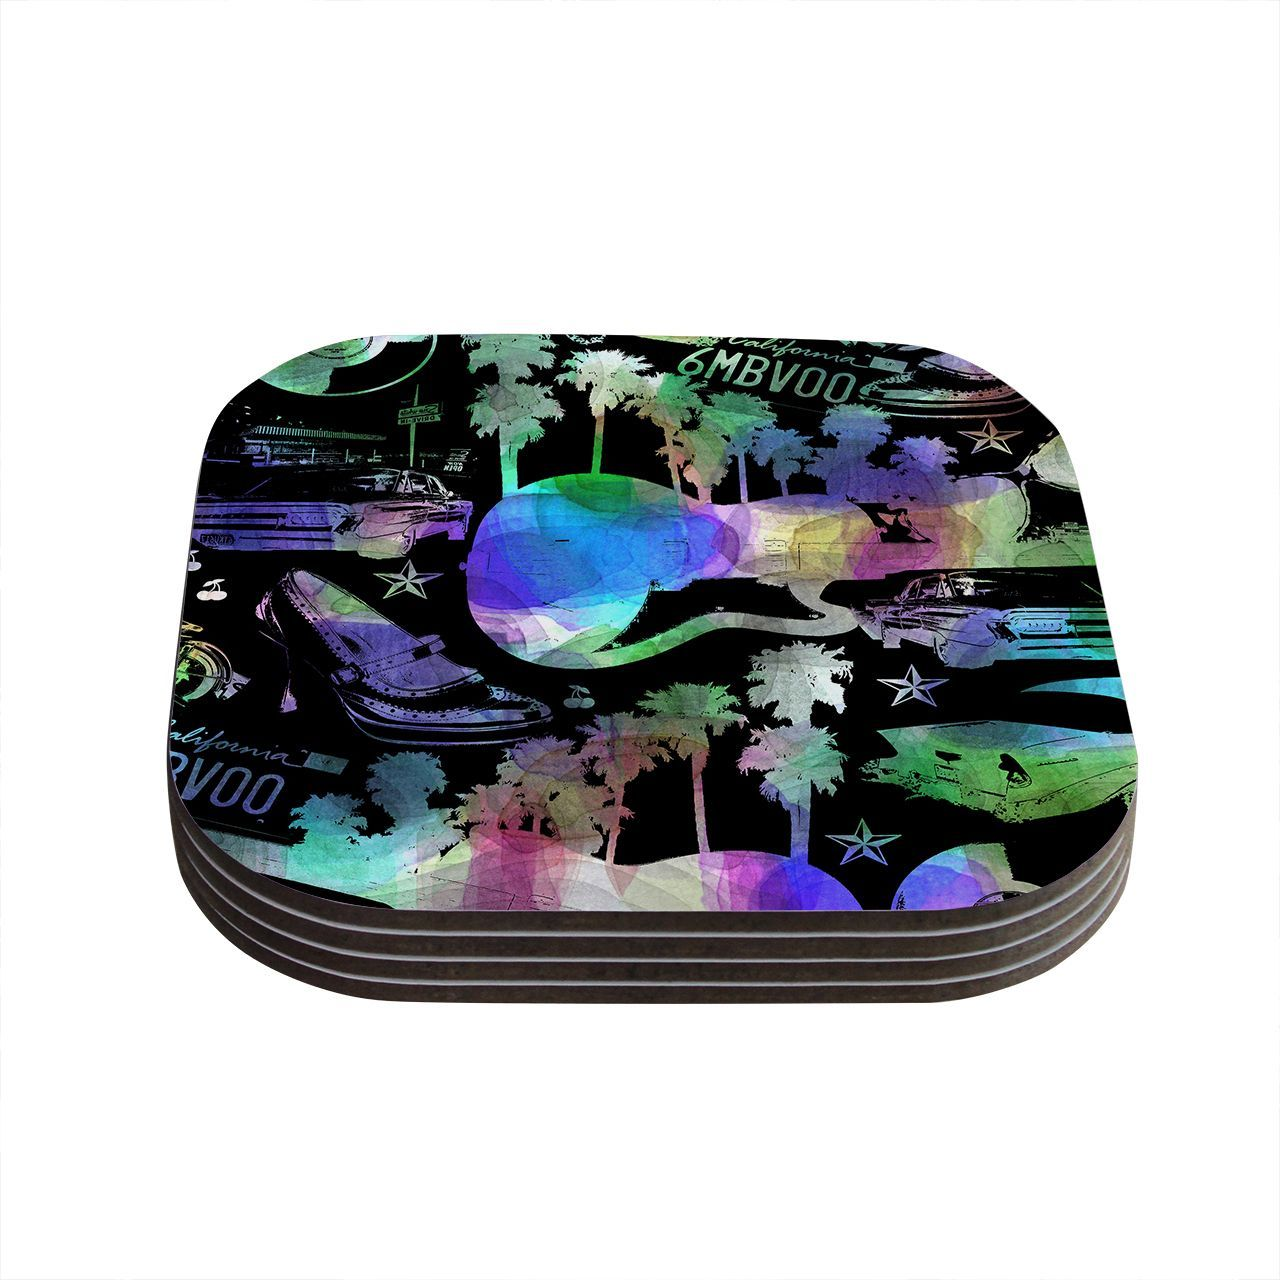 Kess InHouse Gabriela Fuente 'California Dream' Rainbow Abstract Coasters